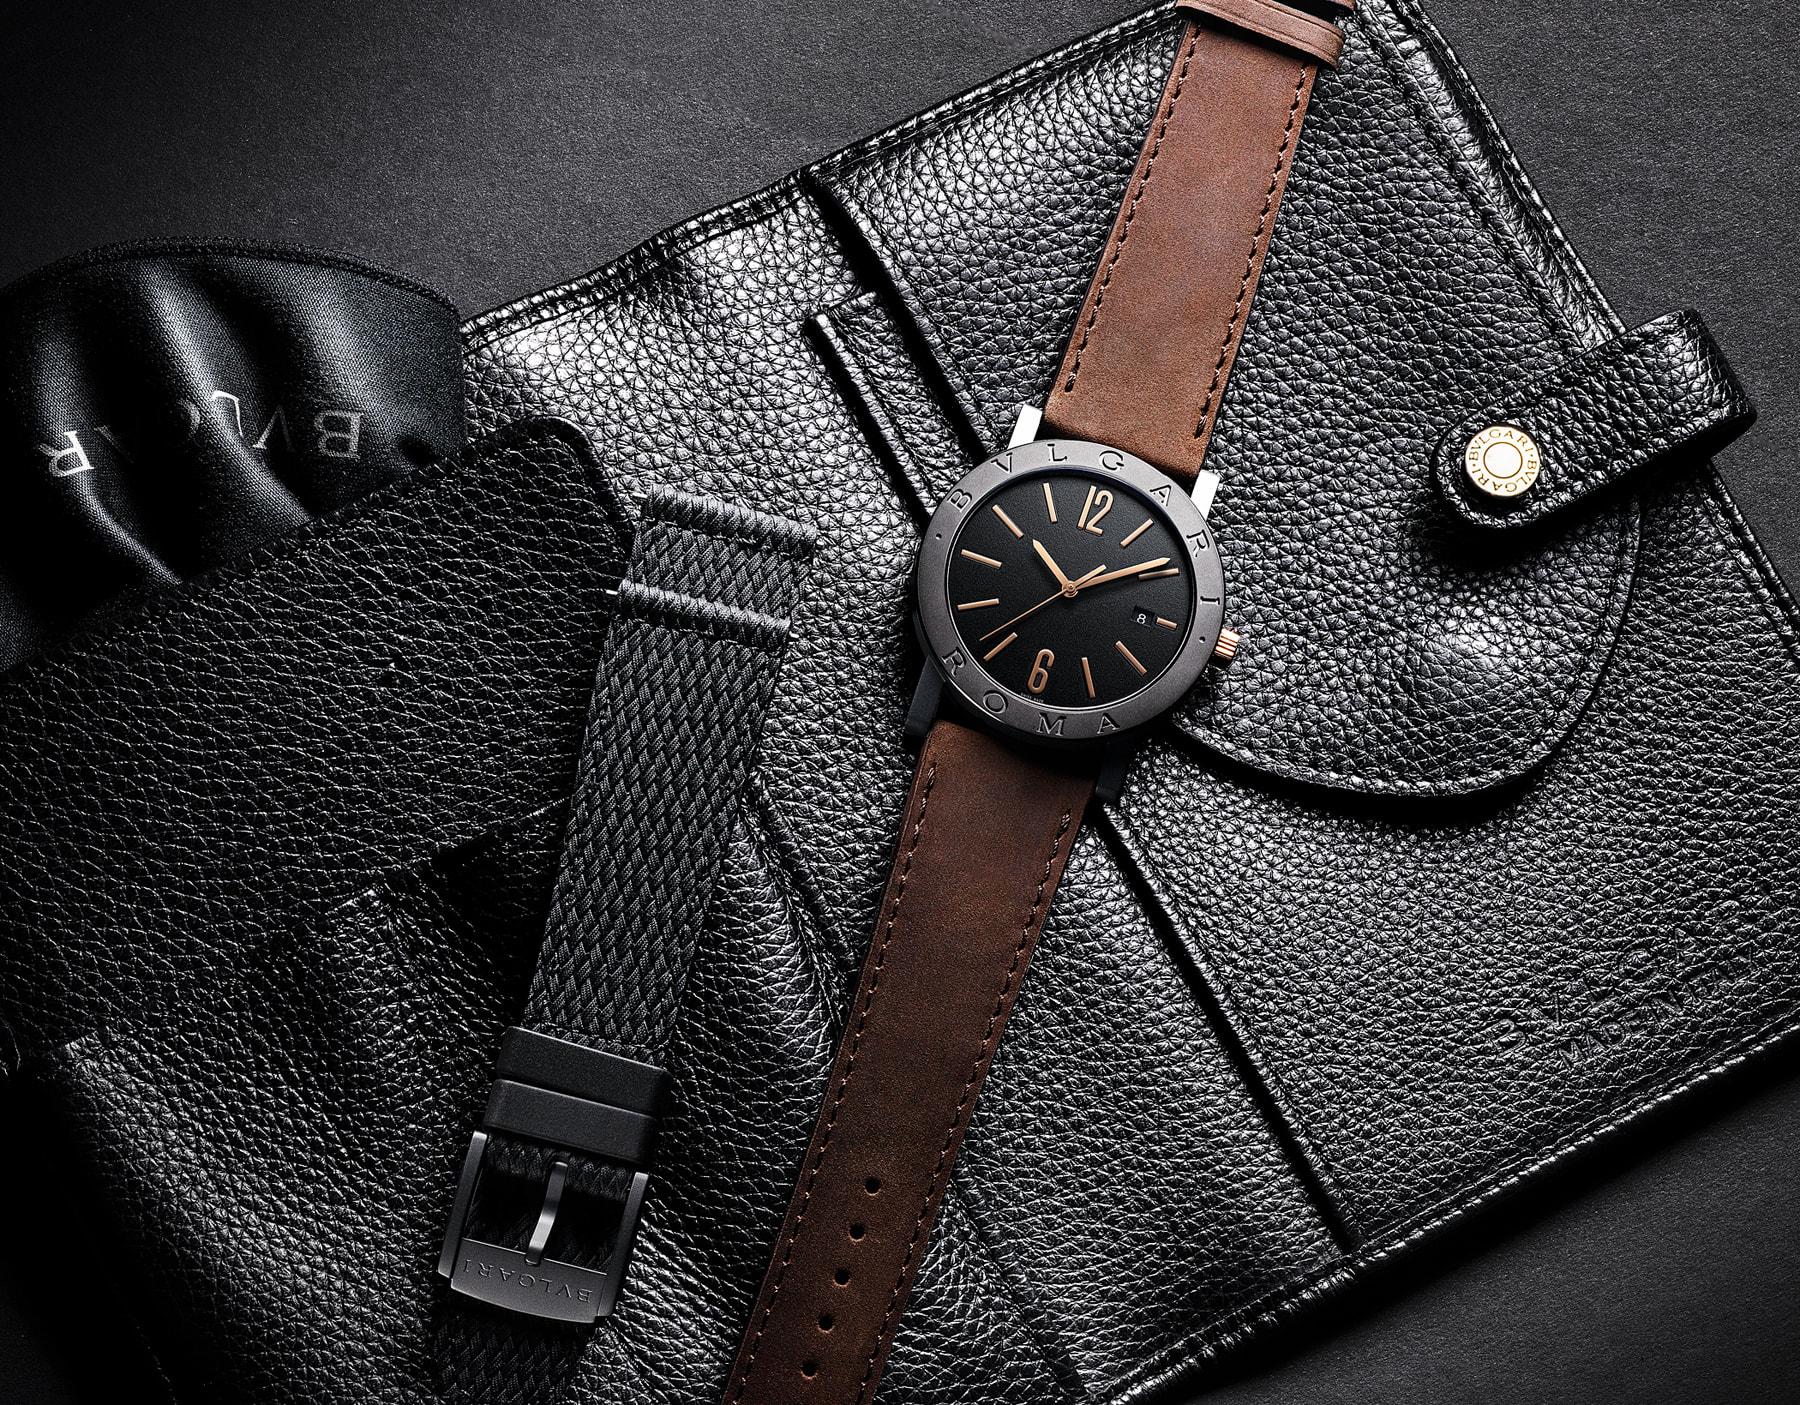 BVLGARI BVLGARI 城市特別版「羅馬」腕錶,搭載機械機芯,自動上鍊。精鋼錶殼,黑色 DLC 類鑽碳高耐磨鍍膜。錶圈鐫刻 BVLGARI ROMA 字樣,透明底蓋。黑色漆面錶盤,玫瑰金時標。棕色小牛皮錶帶,可換式黑色橡膠錶帶。 103219 image 7